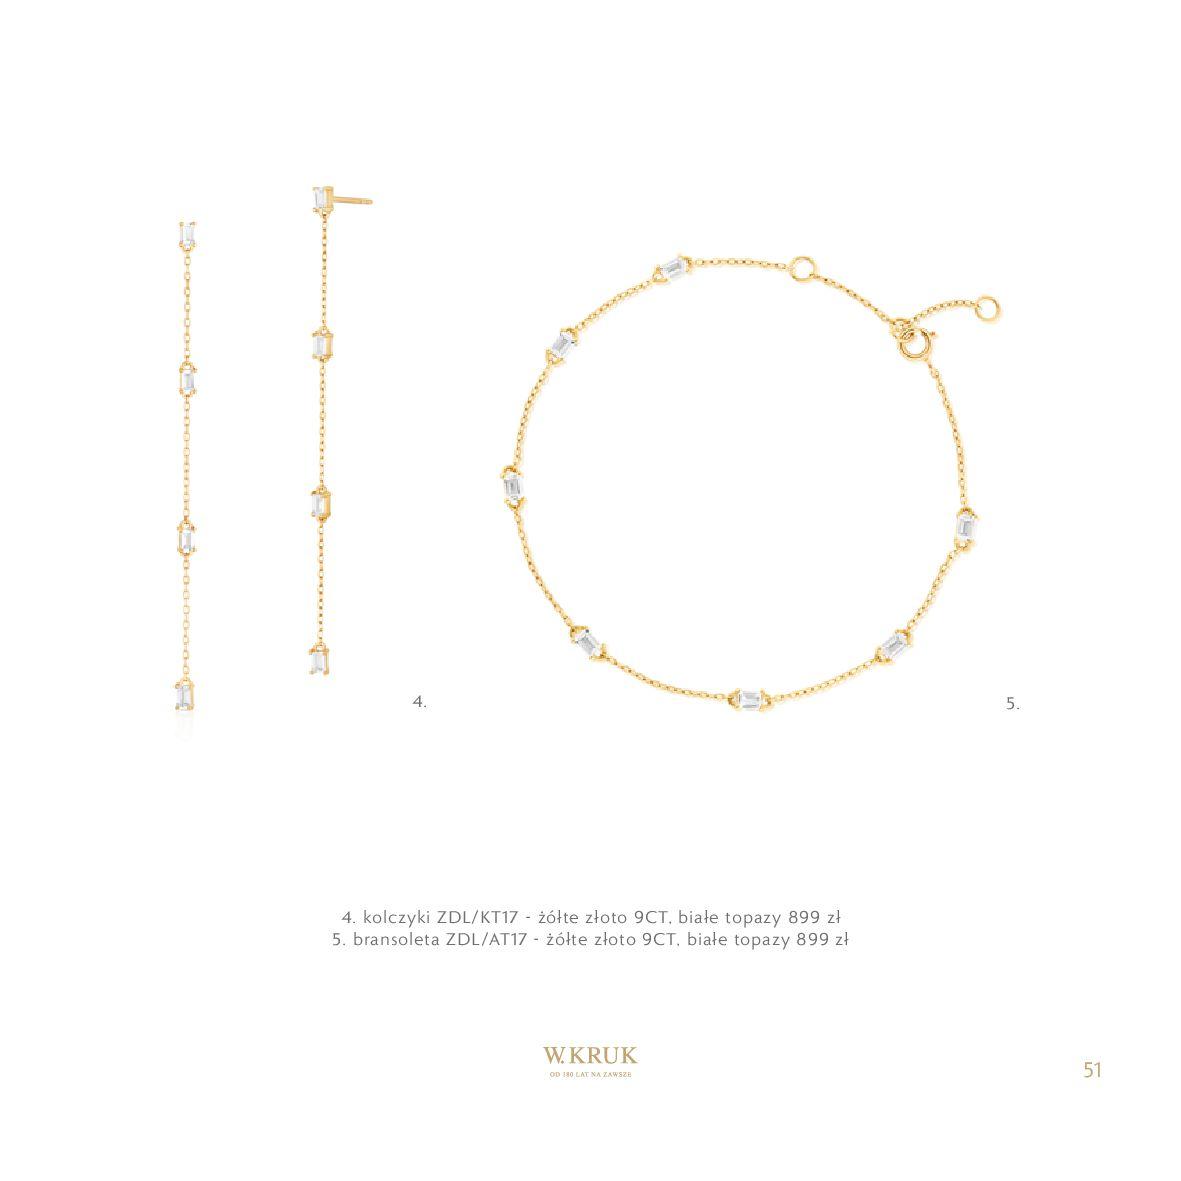 Gazetka W. KRUK: Katalog - Kolekcja Blask 2021-02-17 page-52